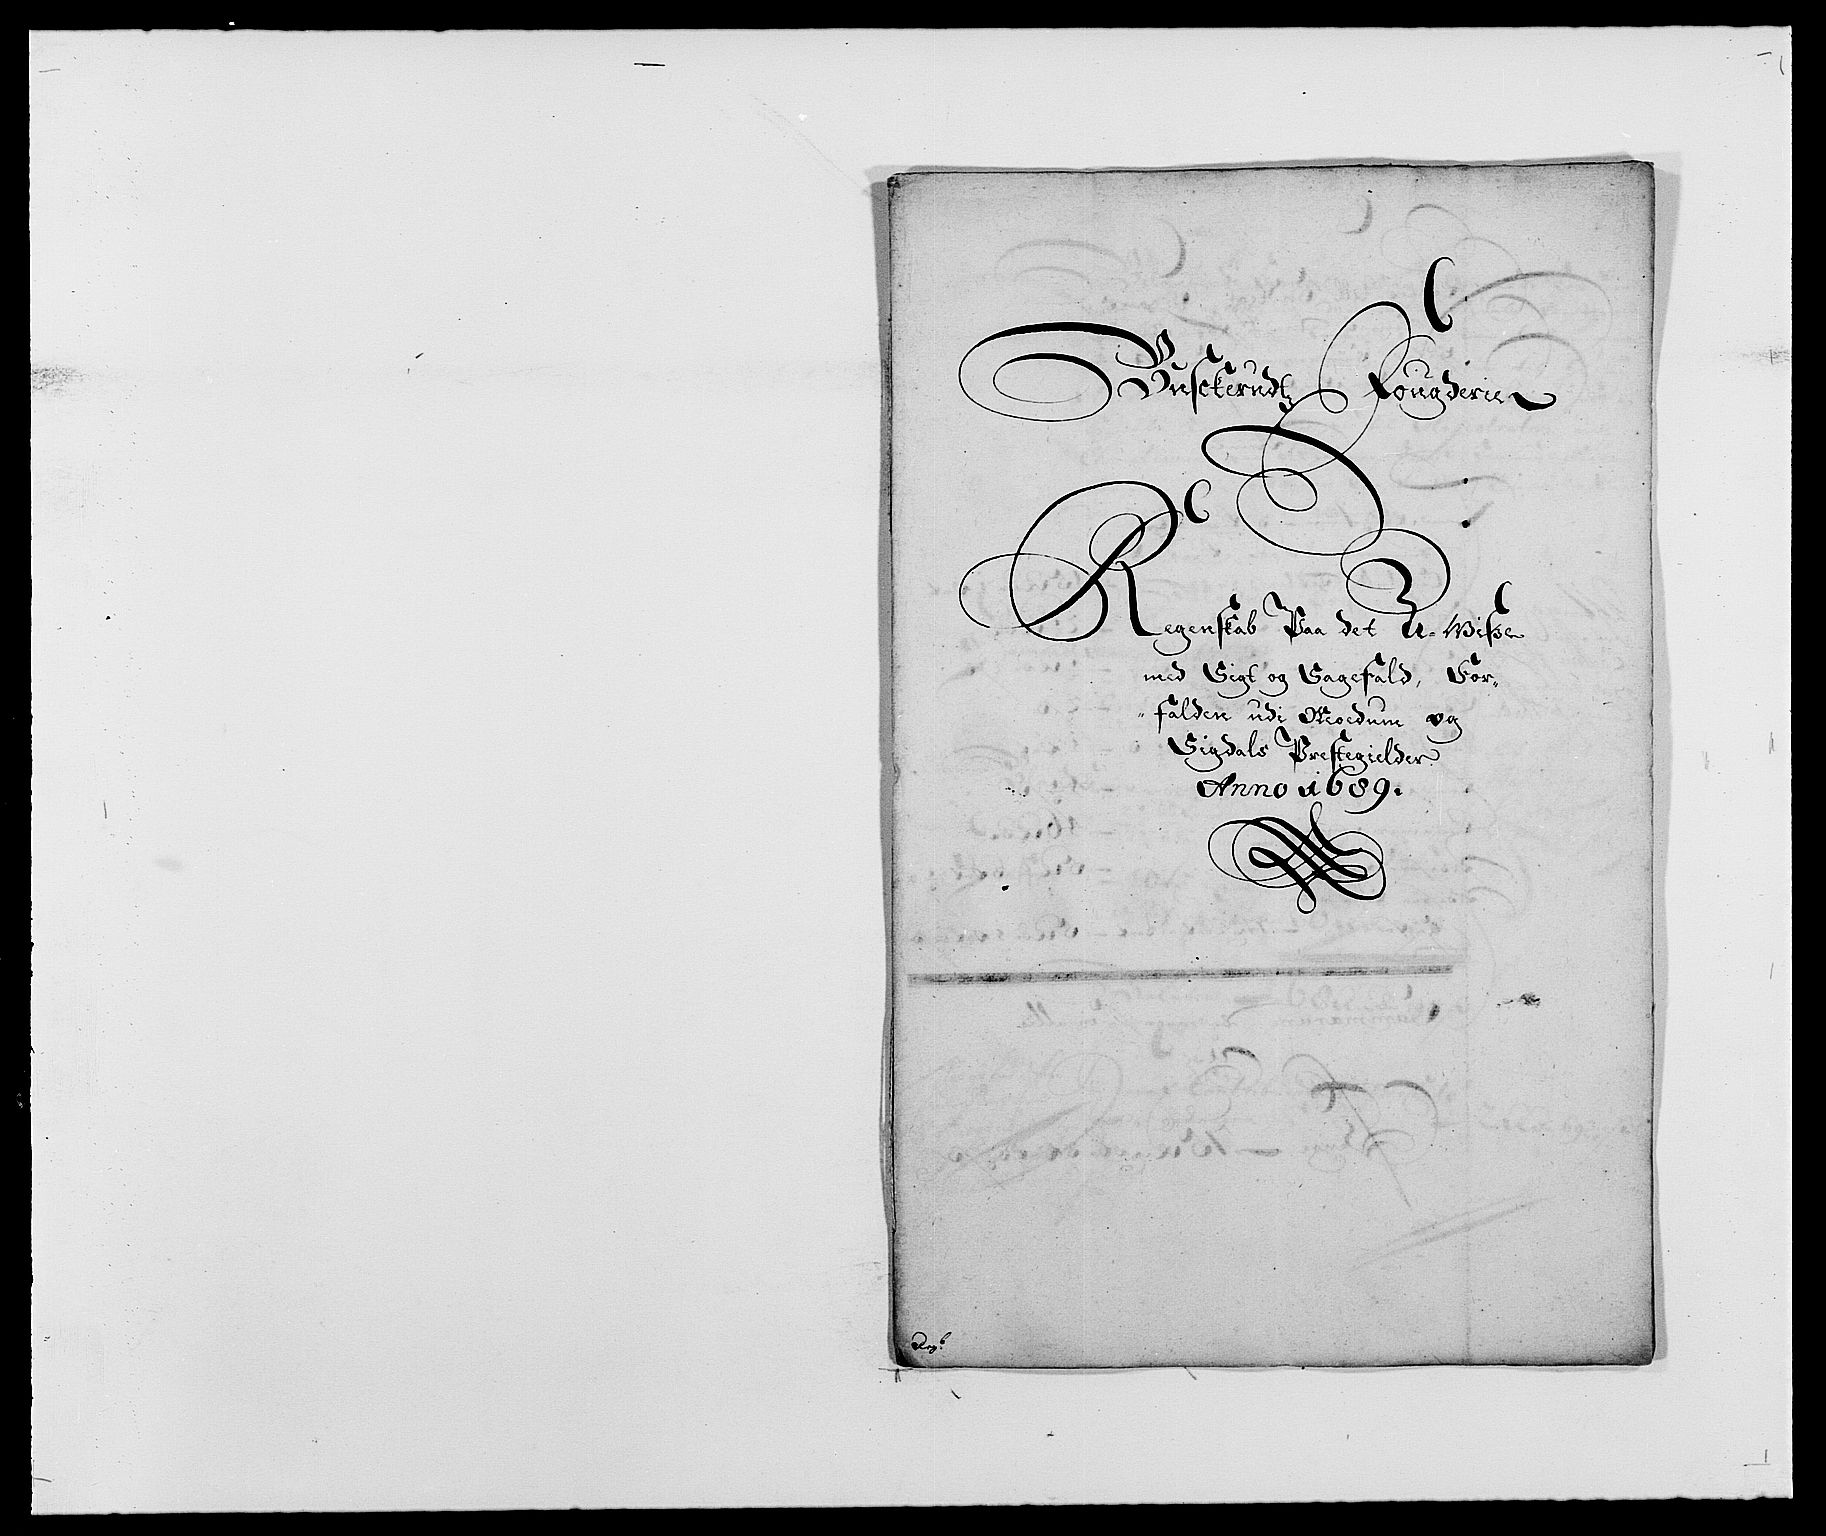 RA, Rentekammeret inntil 1814, Reviderte regnskaper, Fogderegnskap, R25/L1680: Fogderegnskap Buskerud, 1689-1690, s. 19